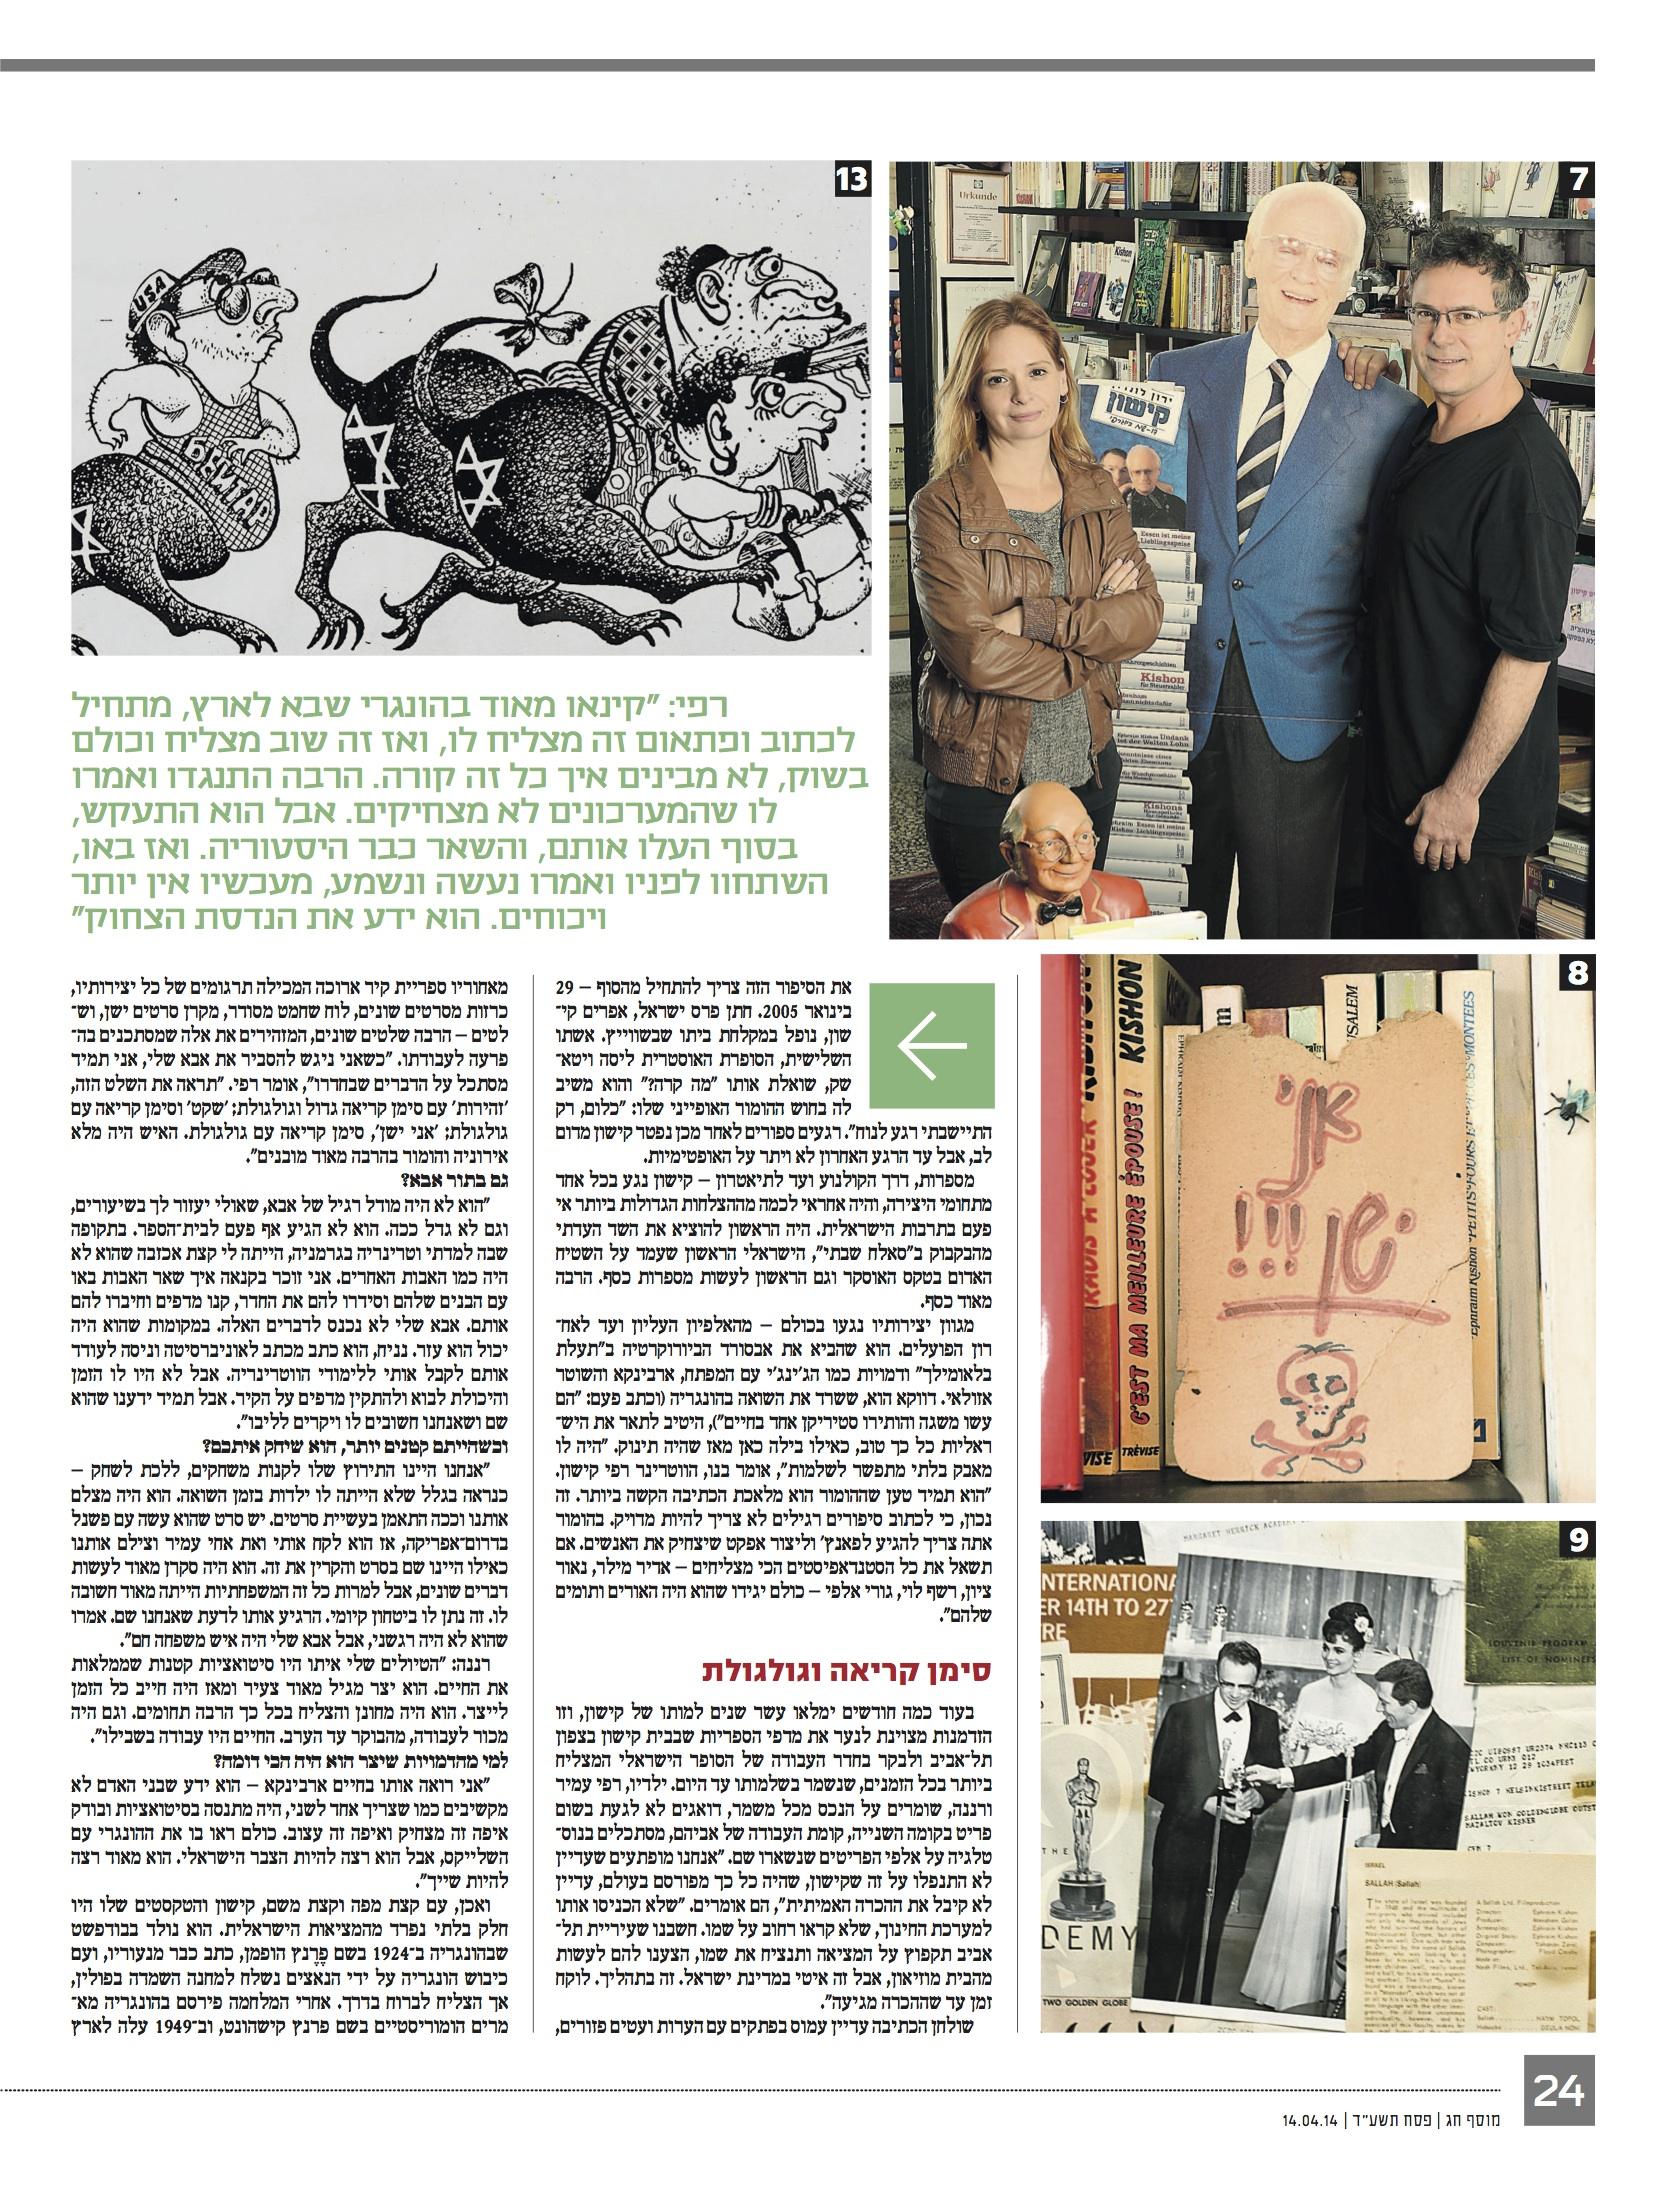 Yediot Aharonot writes about Kishon